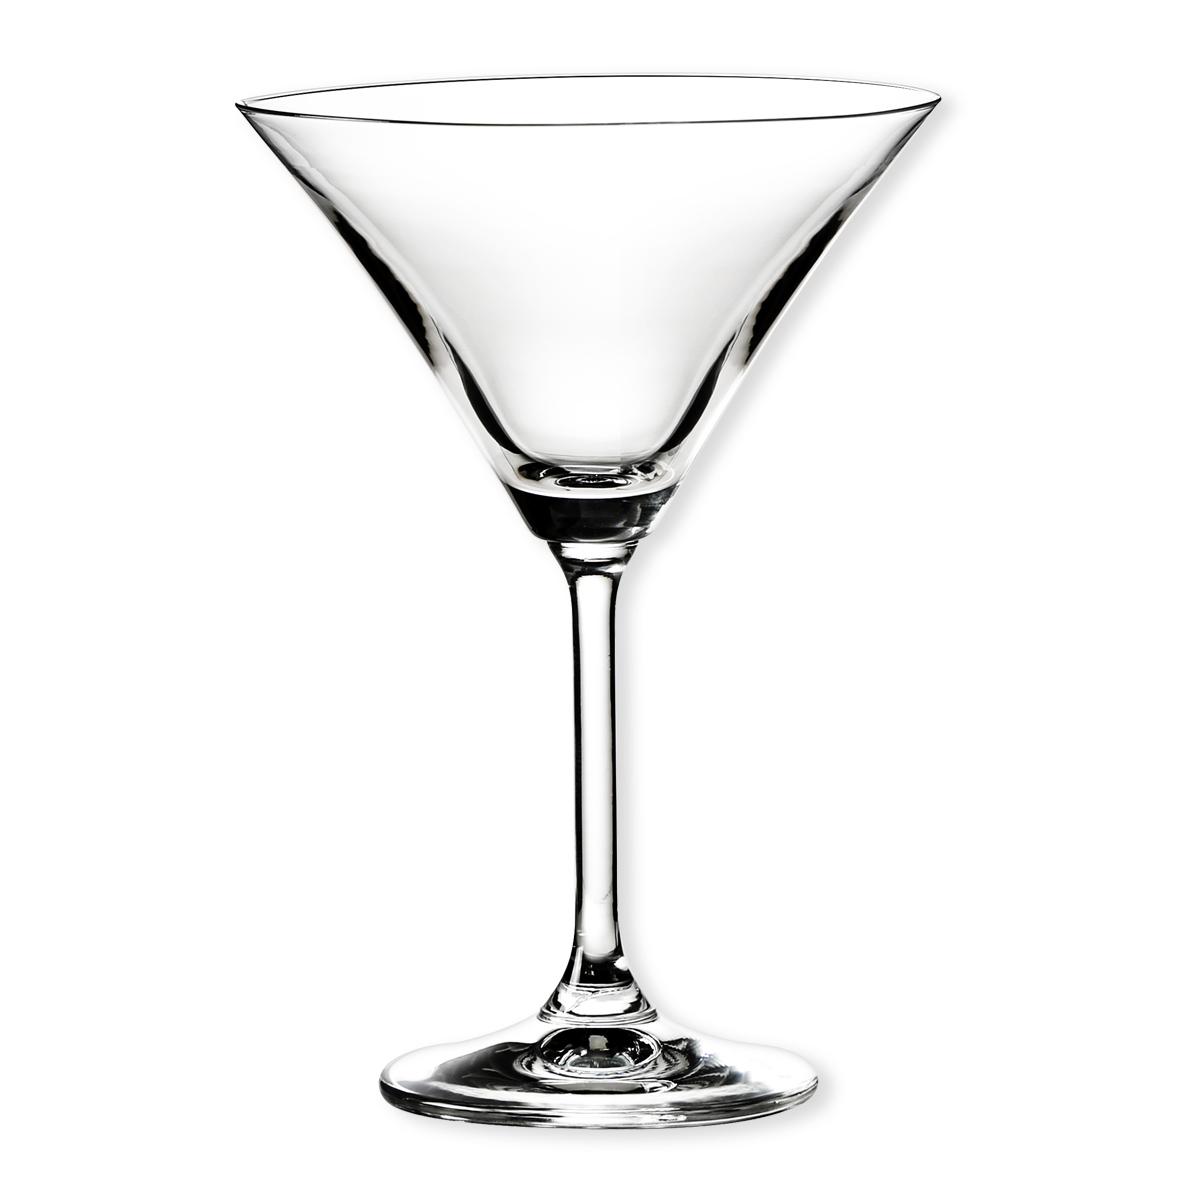 Verre Cosmopolitan Design Verrerie Cocktail Bruno Evrard